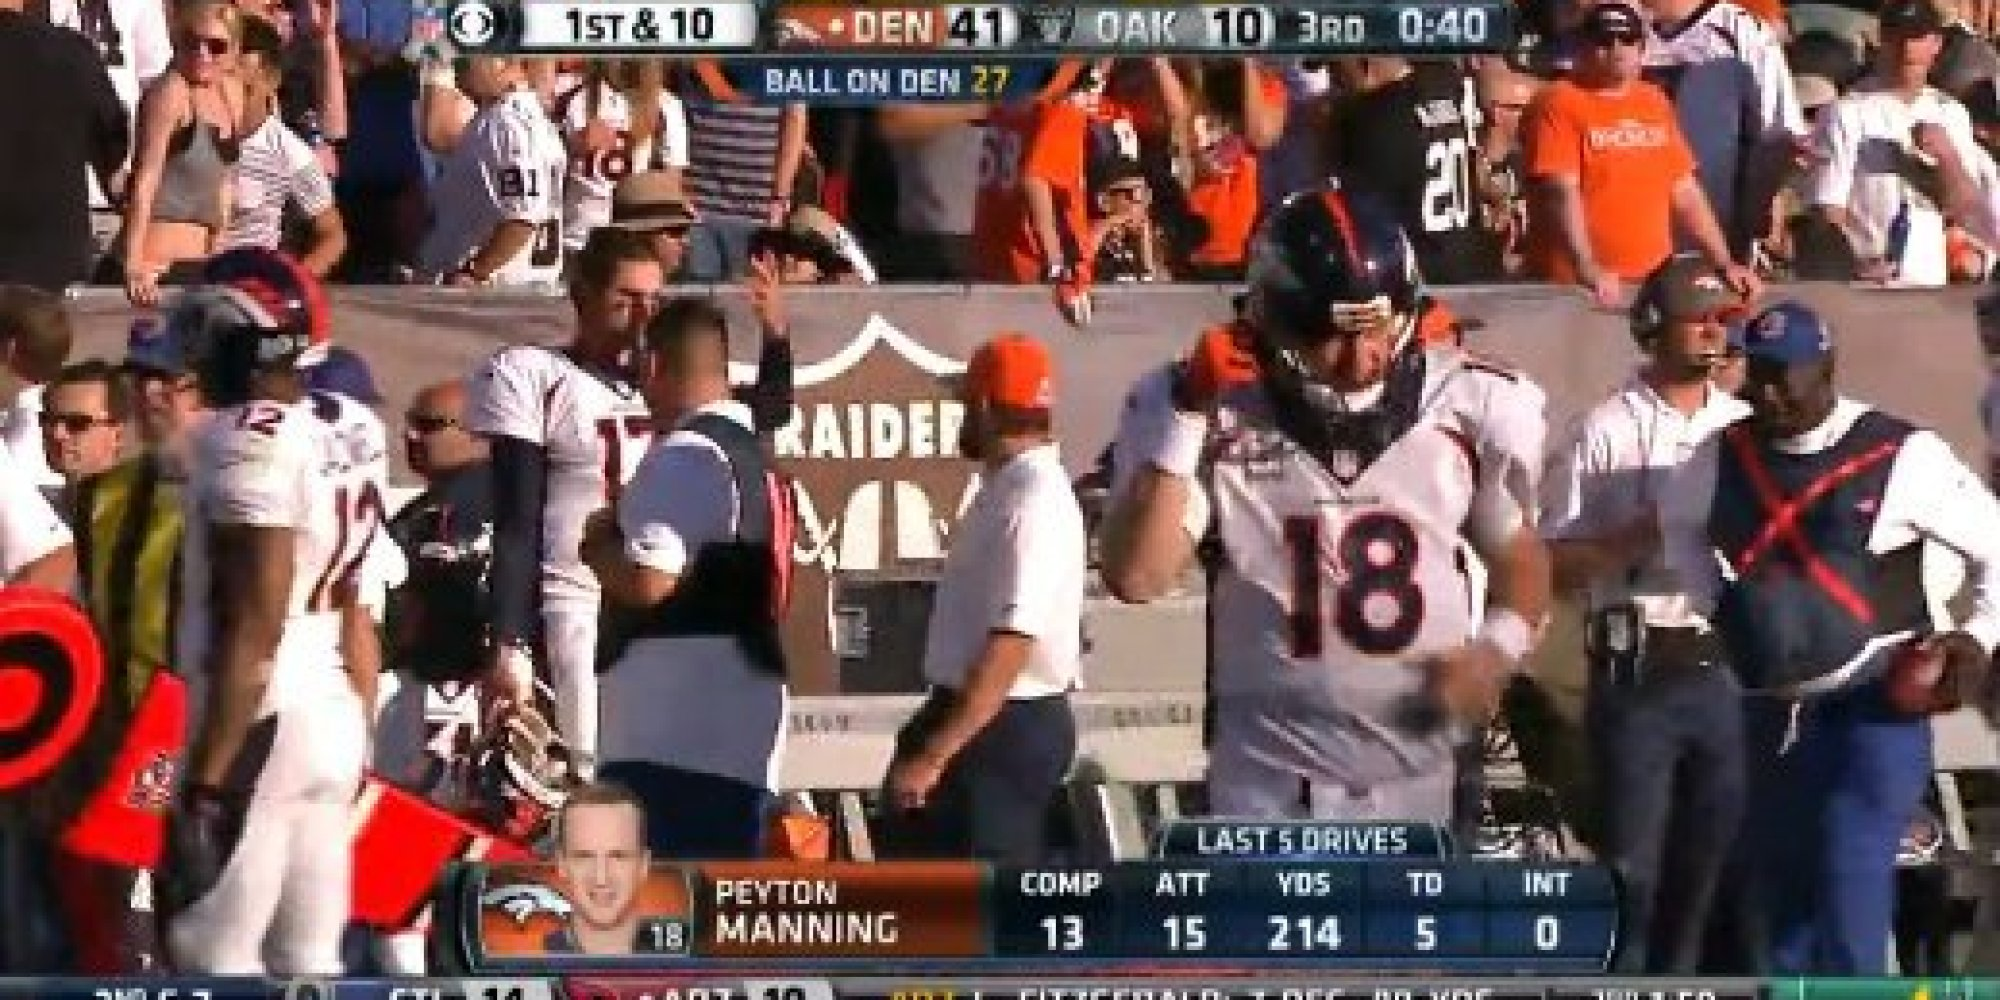 o PEYTON facebook sorry brock osweiler, peyton manning doesn't leave the game until,Funny Airplane Meme Peyton Manning